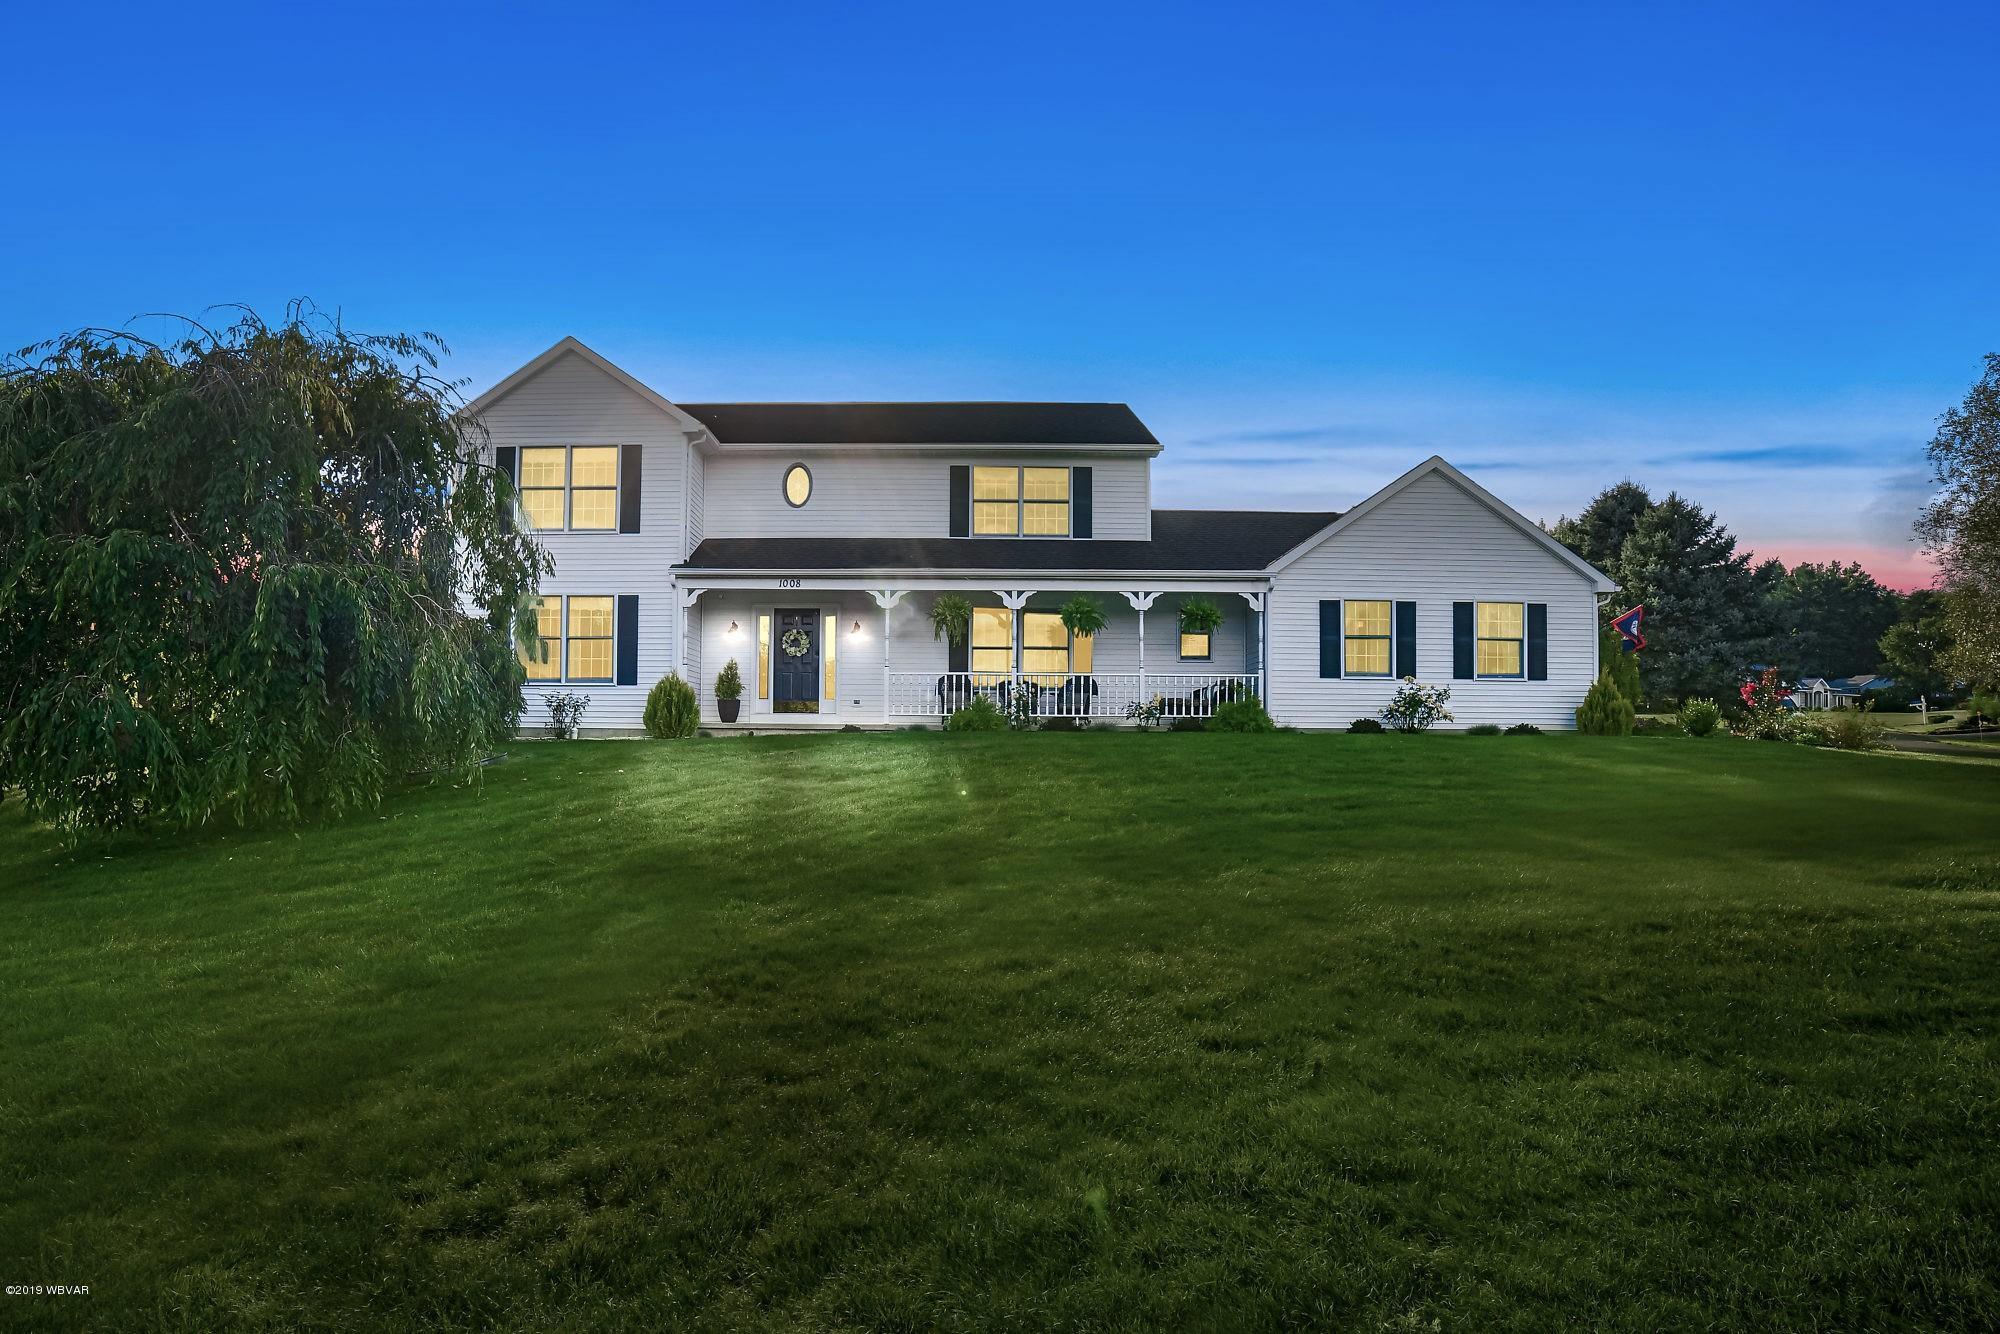 1008 ORIOLE CIRCLE,Lock Haven,PA 17745,4 Bedrooms Bedrooms,5 BathroomsBathrooms,Residential,ORIOLE,WB-88600